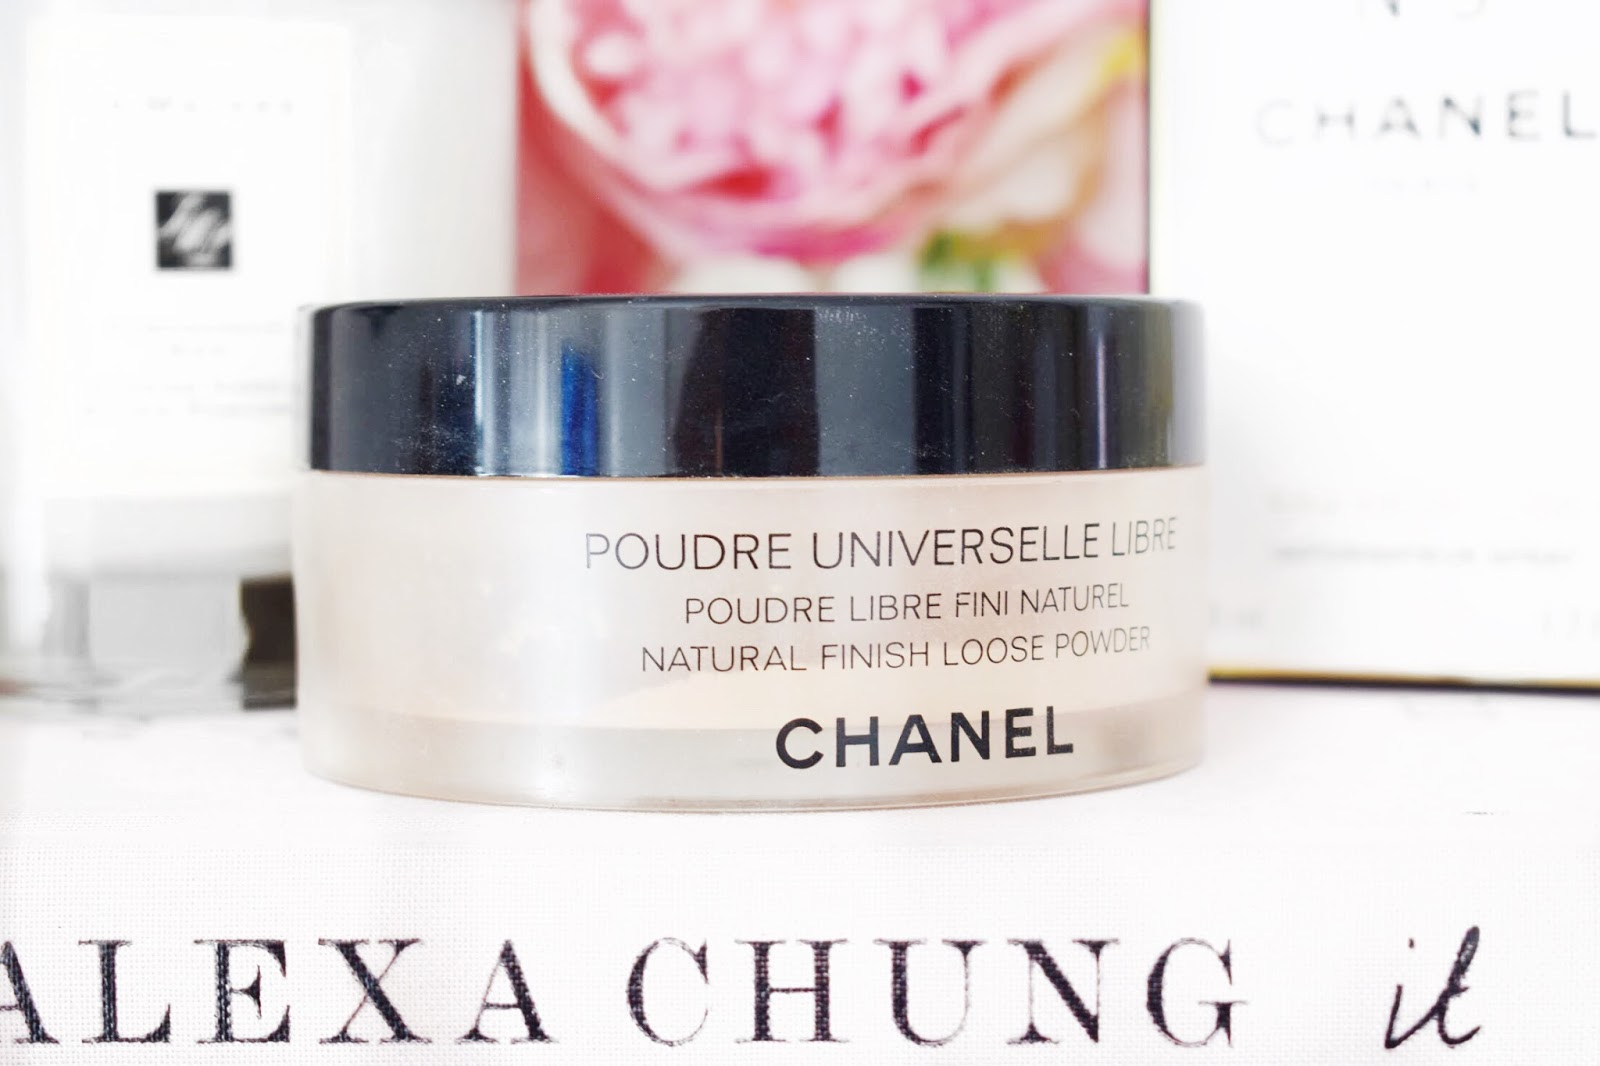 Chanel Poudre Universelle Libre Loose Powder Review